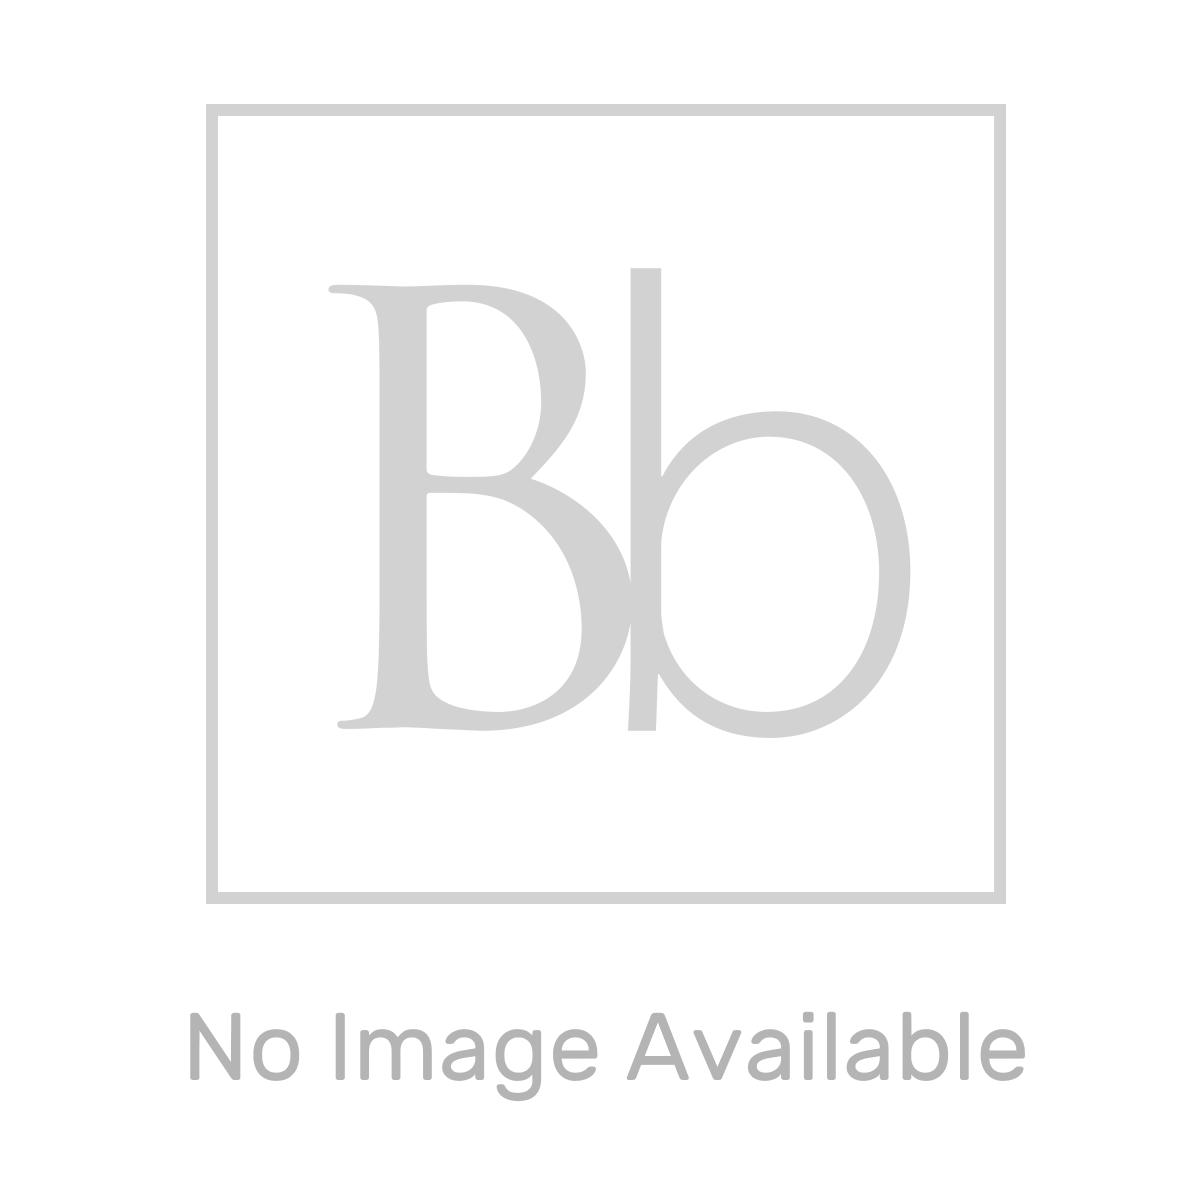 Premier Acrylic Front Bath Panel 1700mm